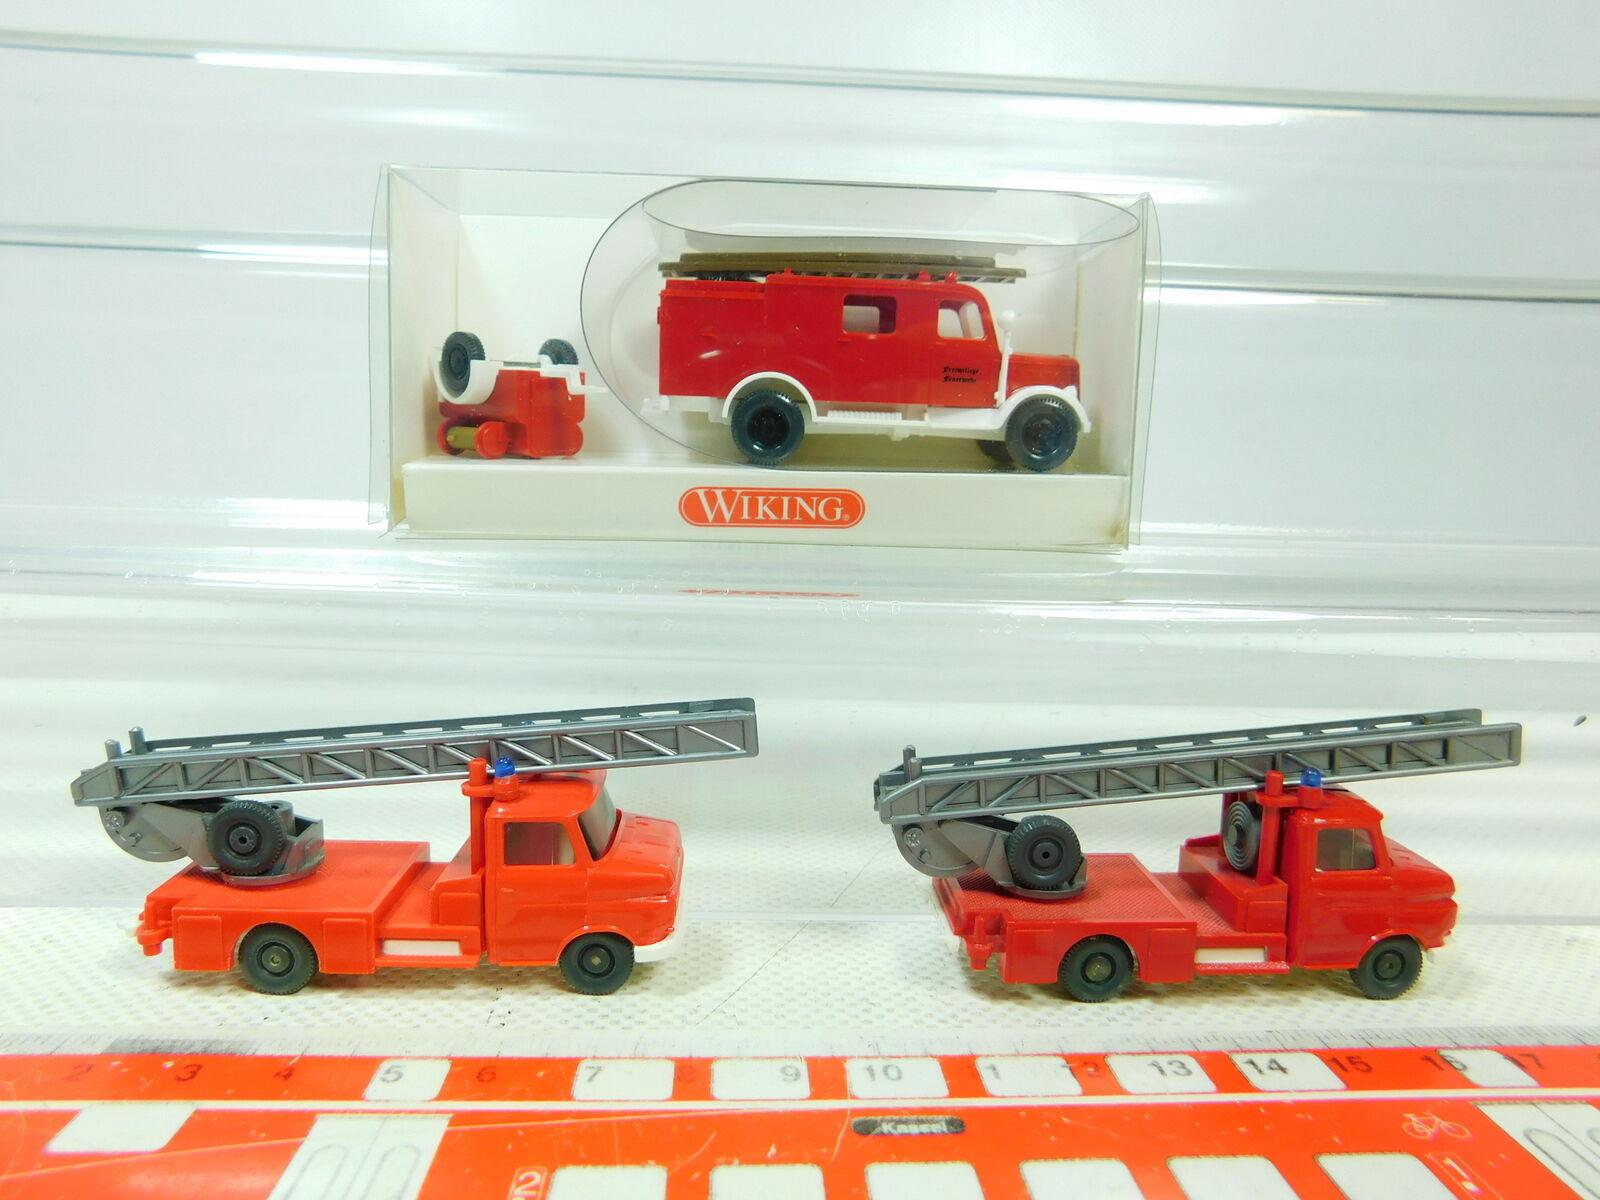 Bt358-0, 5  3x WIKING h0 1 87 LF 8 Drehleiter OPEL Pompiers FW, neuw 1x neuf dans sa boîte